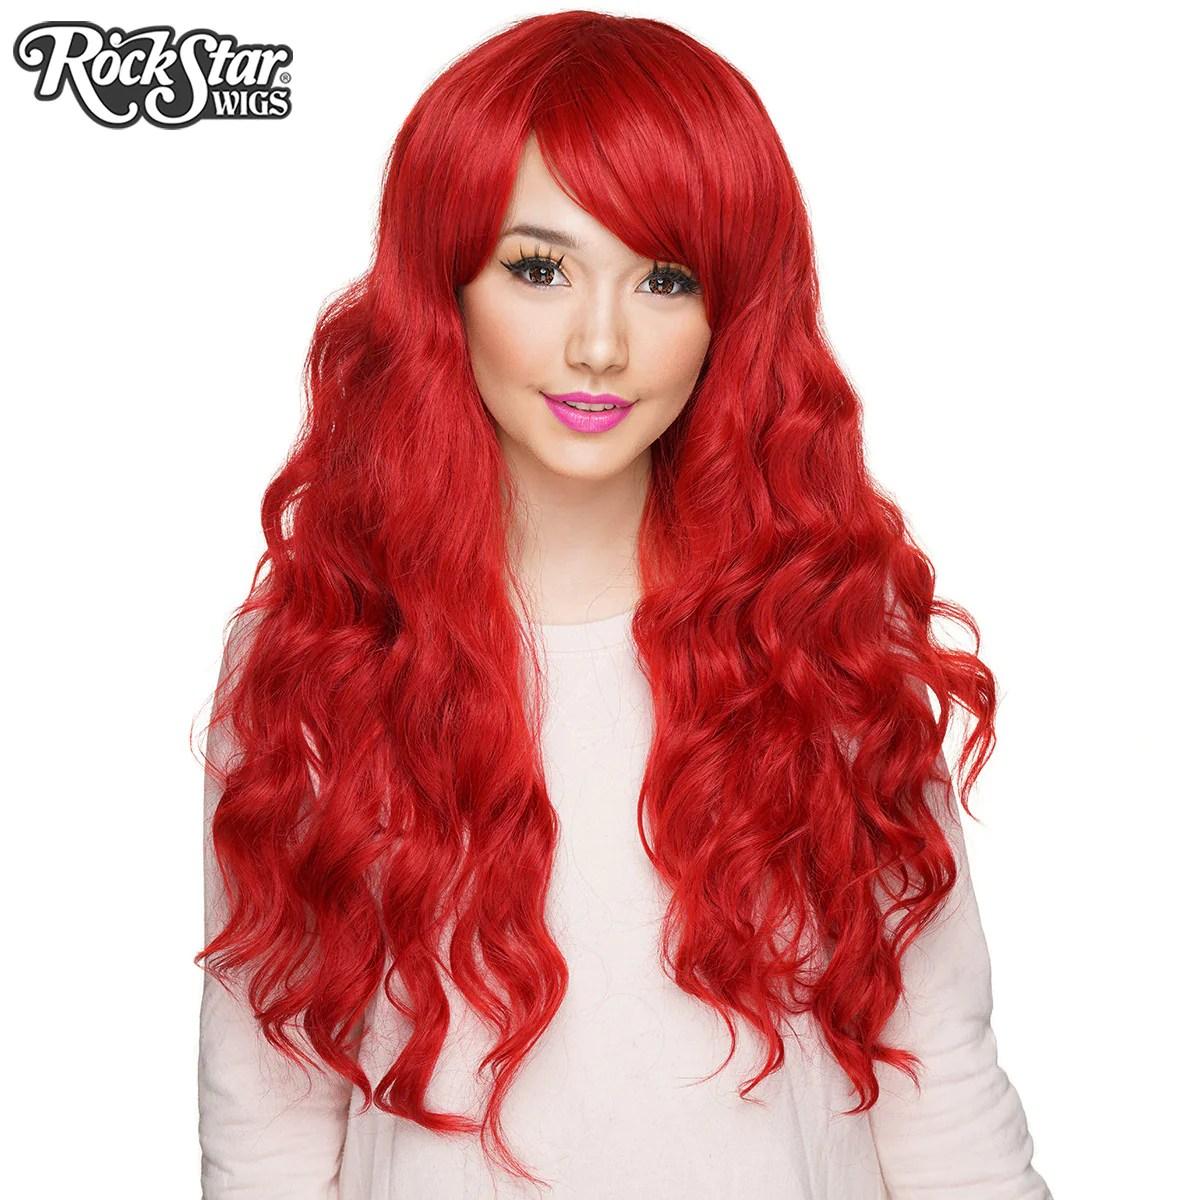 Gothic Lolita Wigs Classic Wavy Mermaid Lolita Collection  Crimson Red  Rockstar Wigs